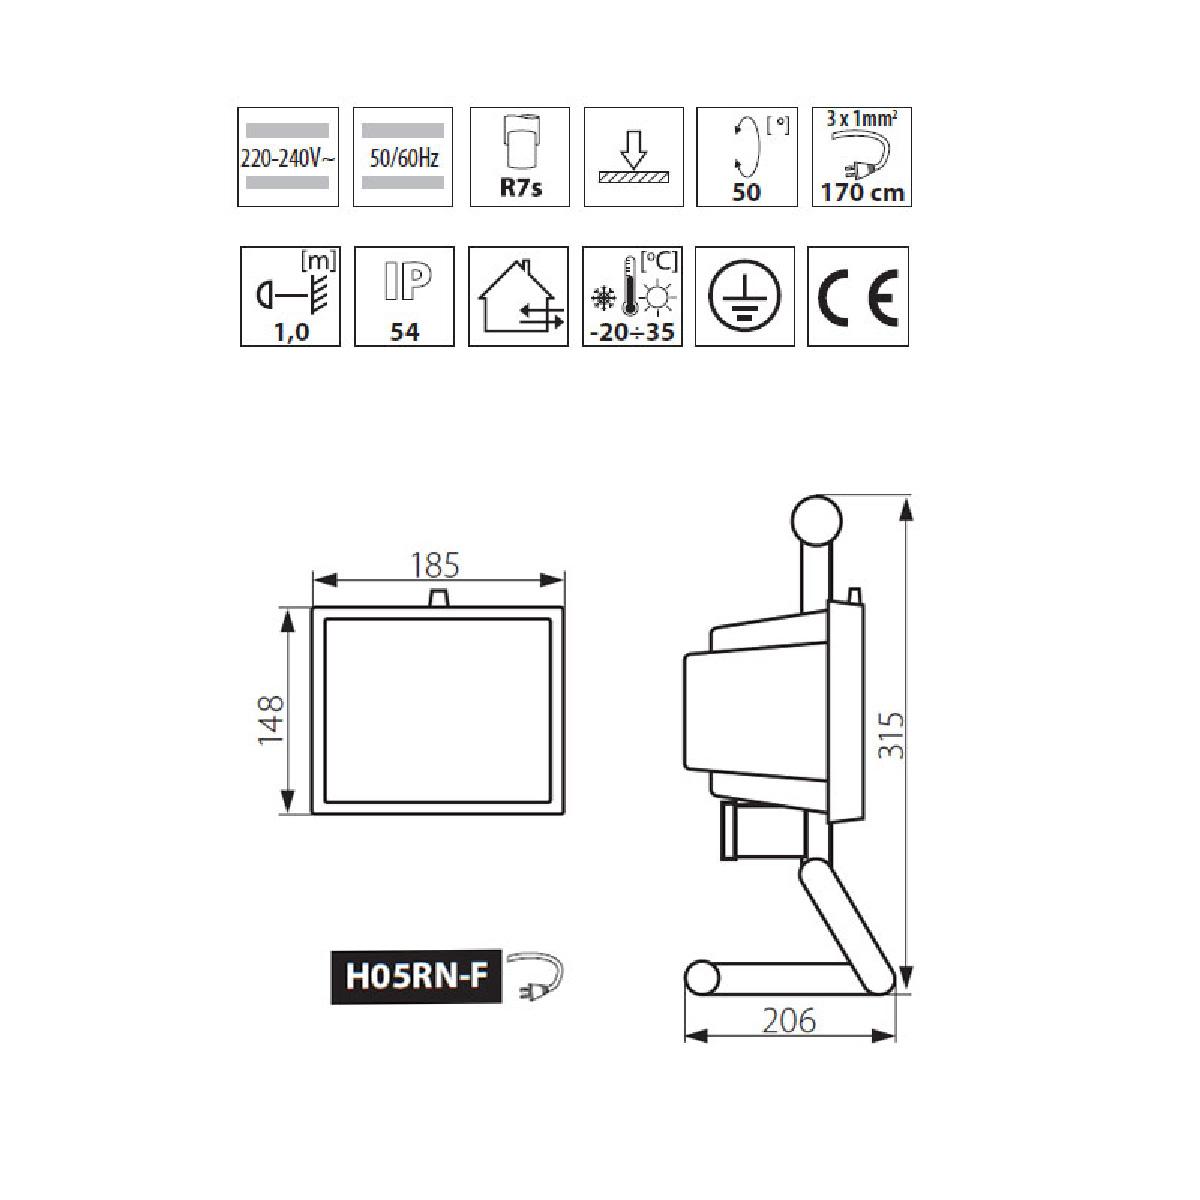 au en halogenstrahler mit bewegungsmelder pr senzmelder. Black Bedroom Furniture Sets. Home Design Ideas